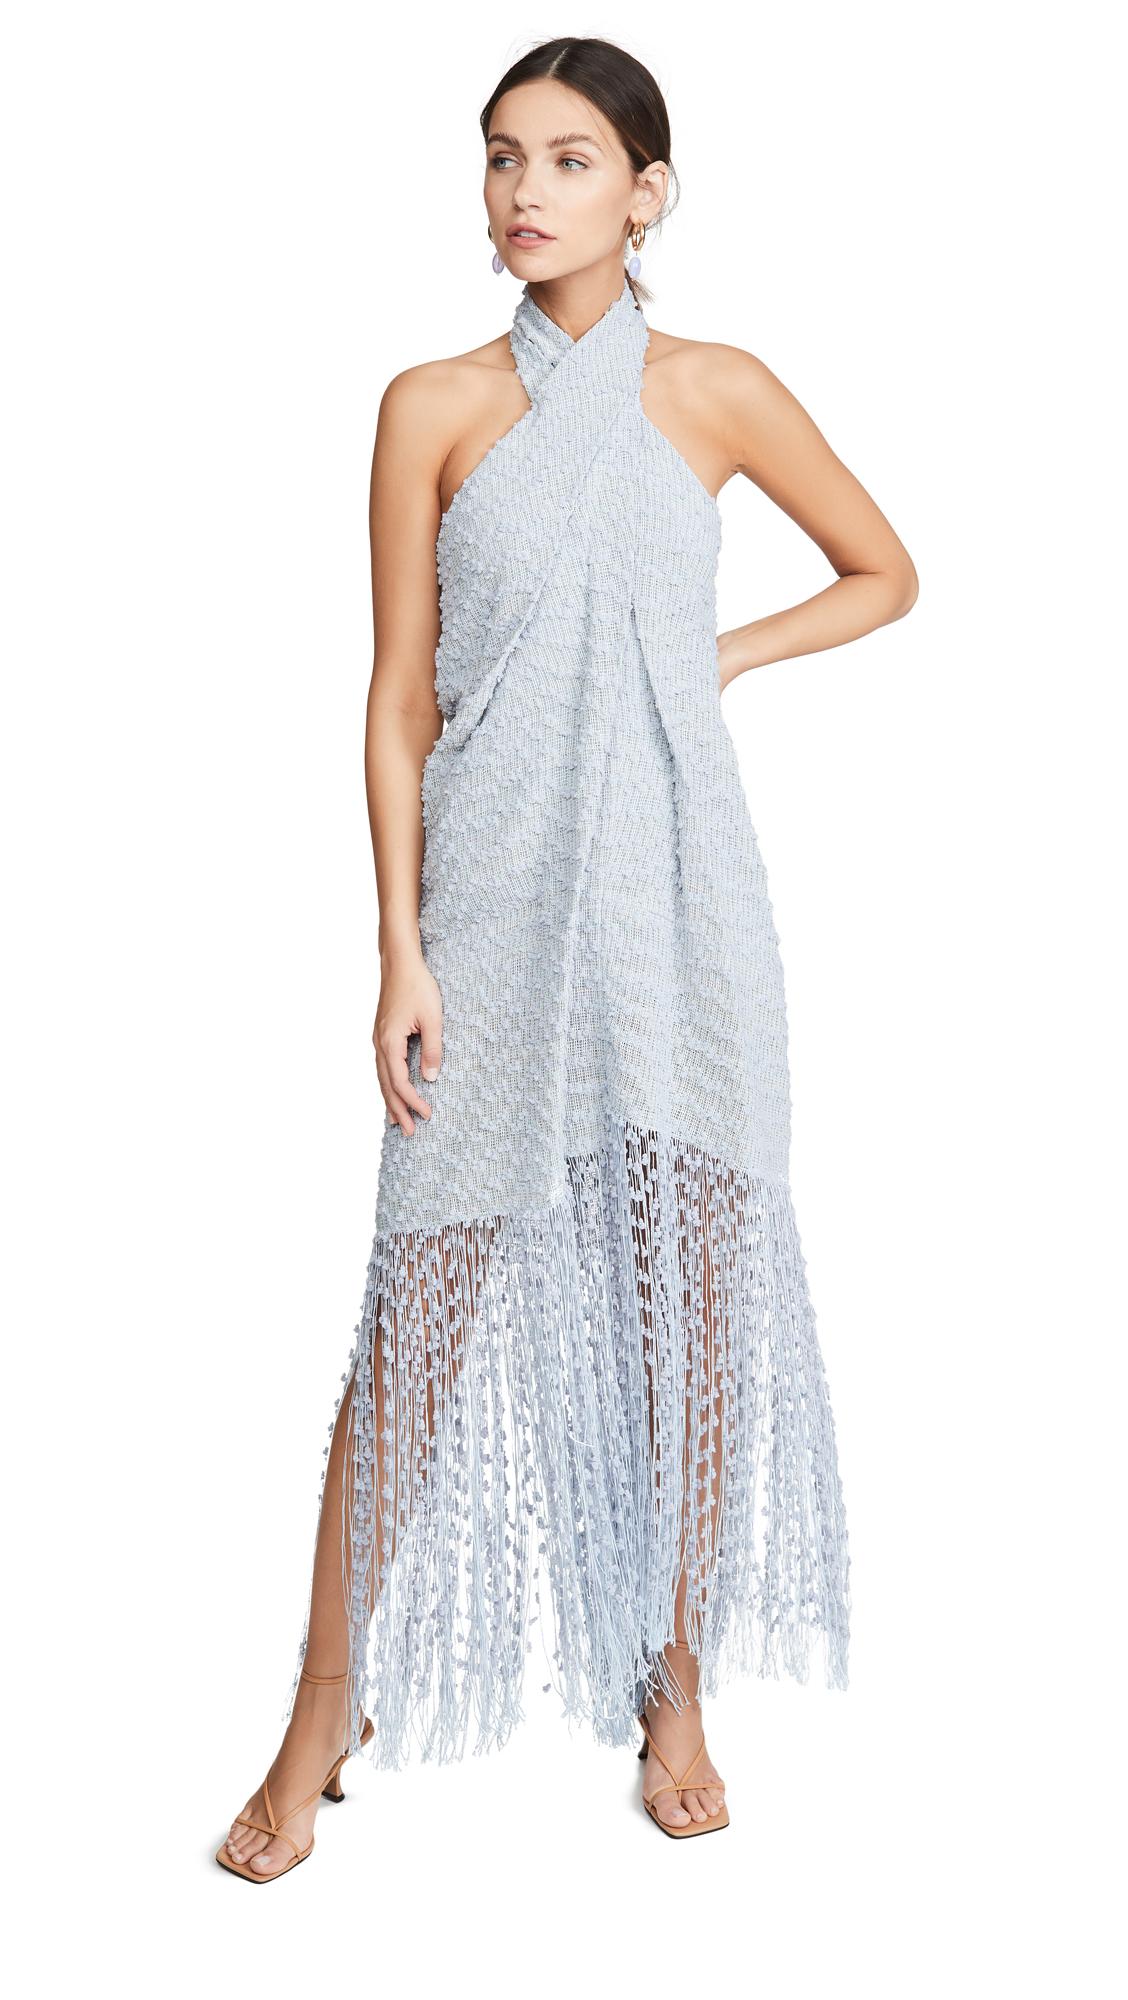 Jacquemus The Cortese Dress - 40% Off Sale